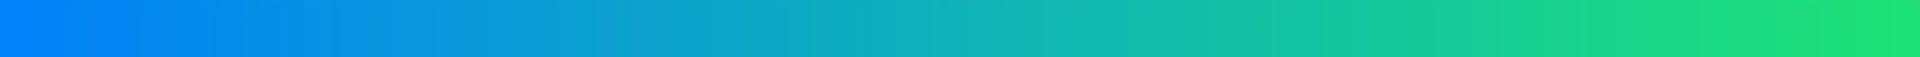 Blue green gradient divider bar horizontal